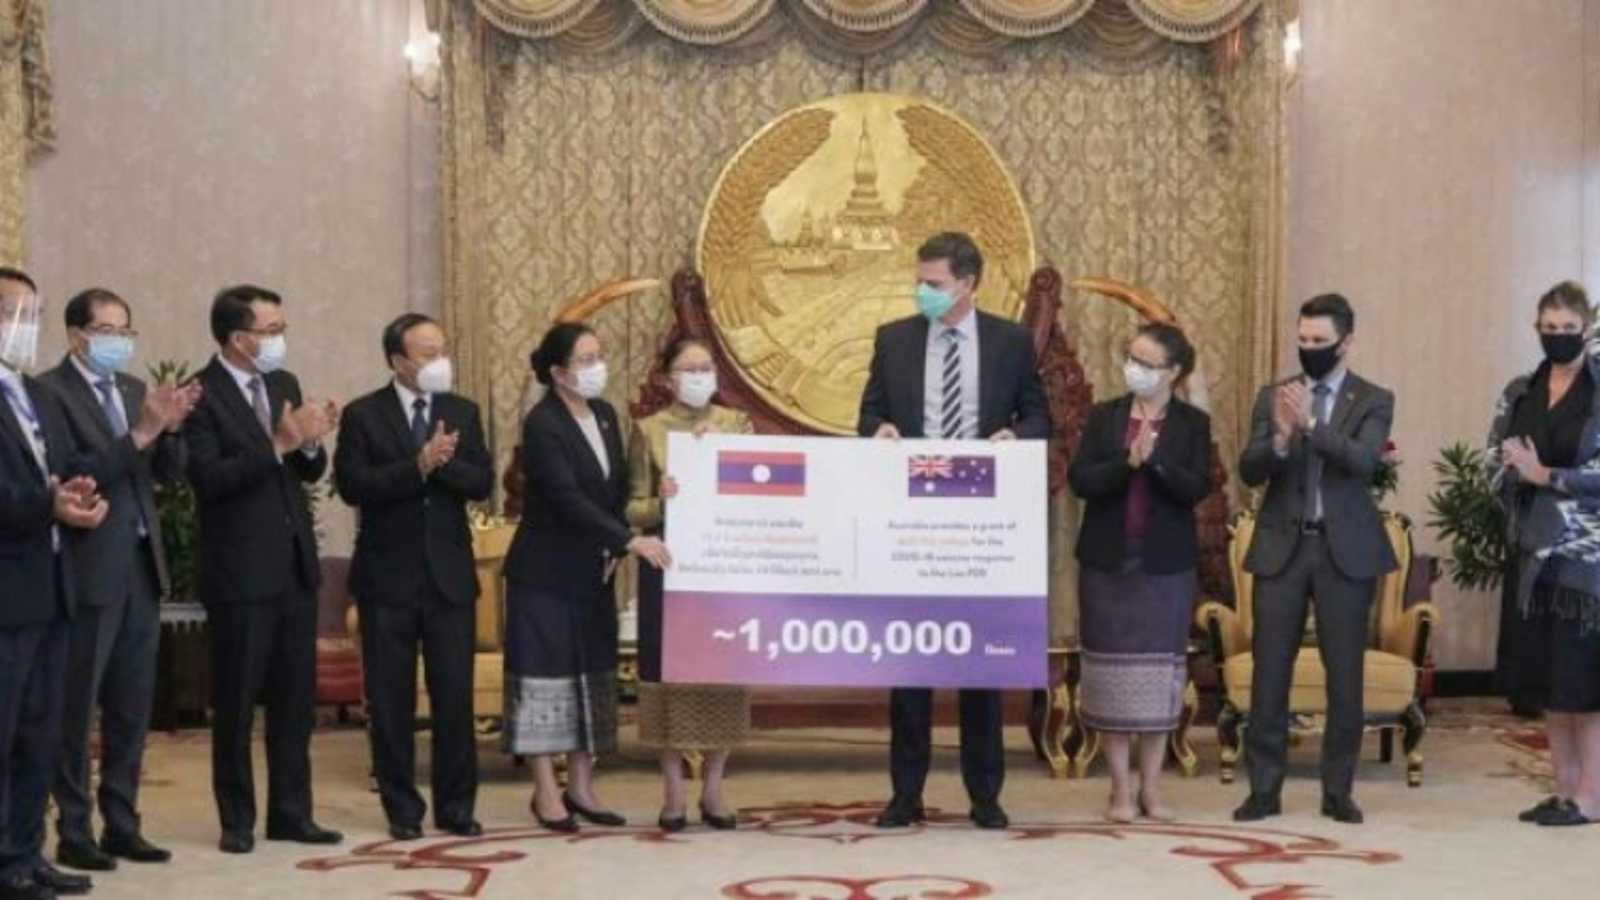 Australia viện trợ cho Lào1 triệu liều vaccine ngừa Covid-19